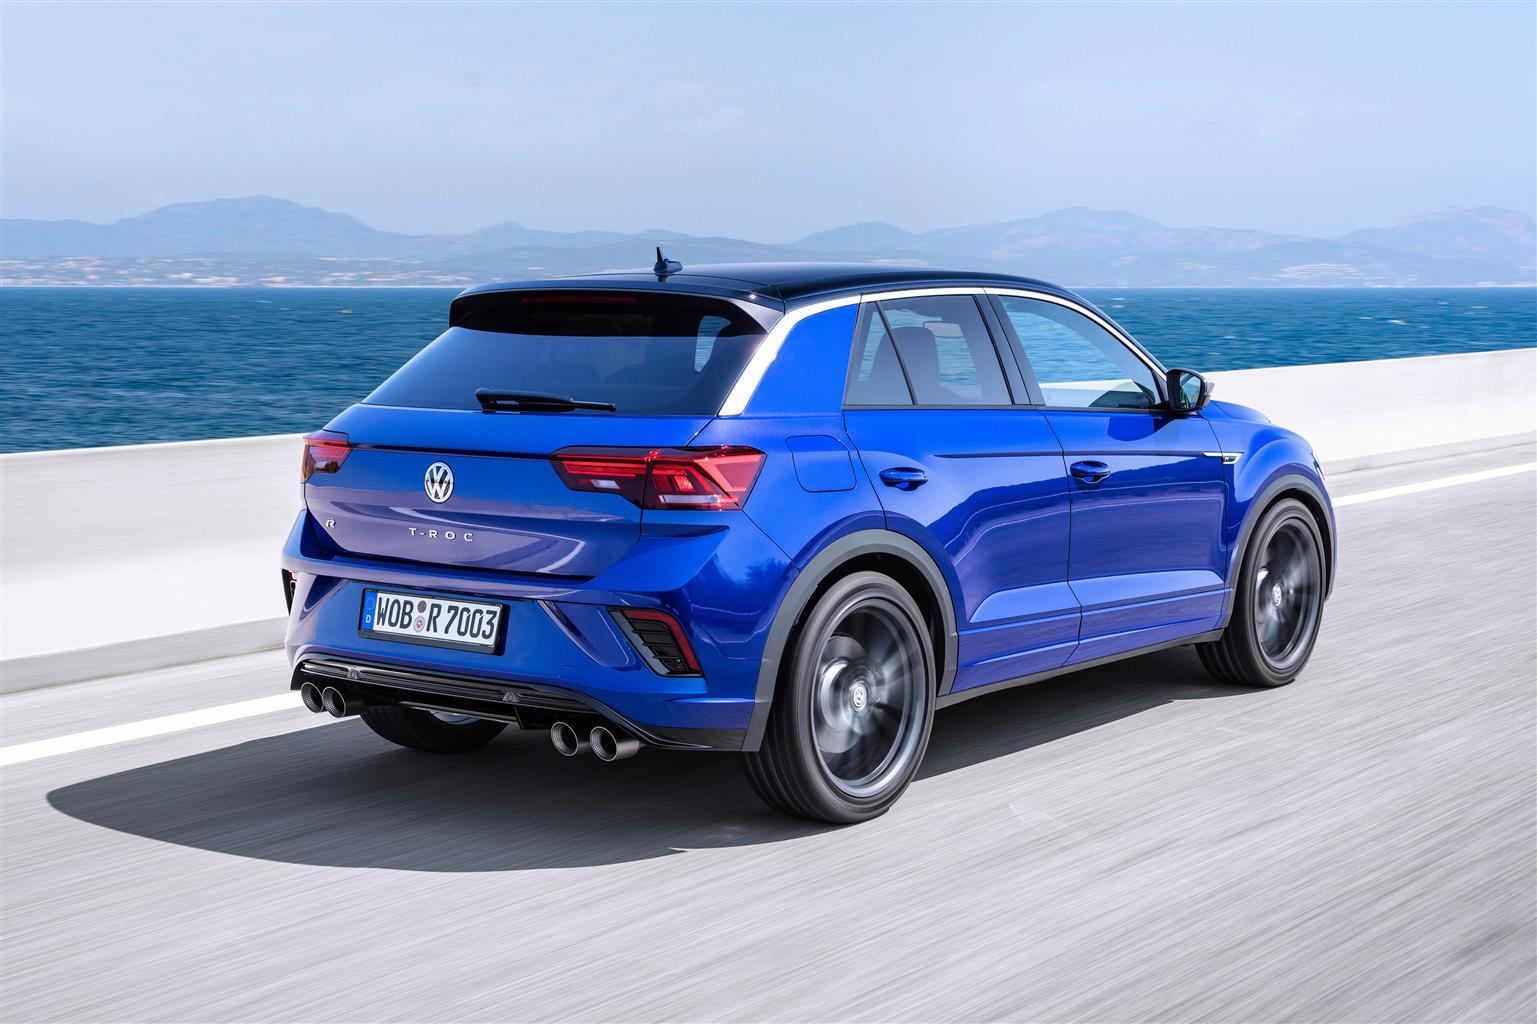 Volkswagen T-Roc R - Foto ufficiali